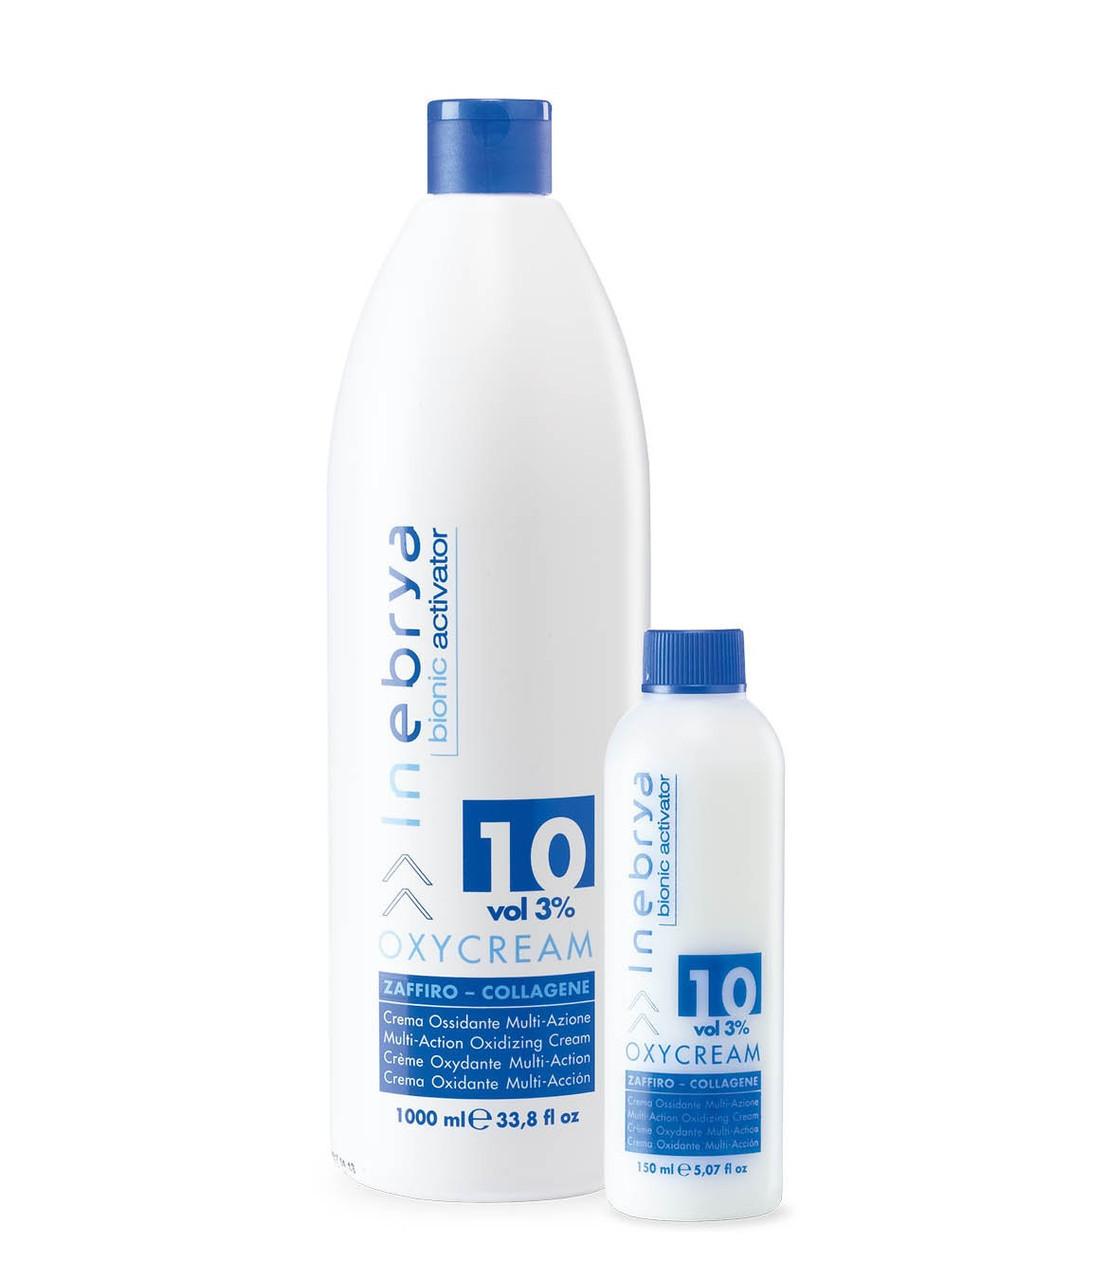 "Крем-окислитель Сапфир-коллаген"" 10, 3%, Inebrya Bionic, 1000ml"